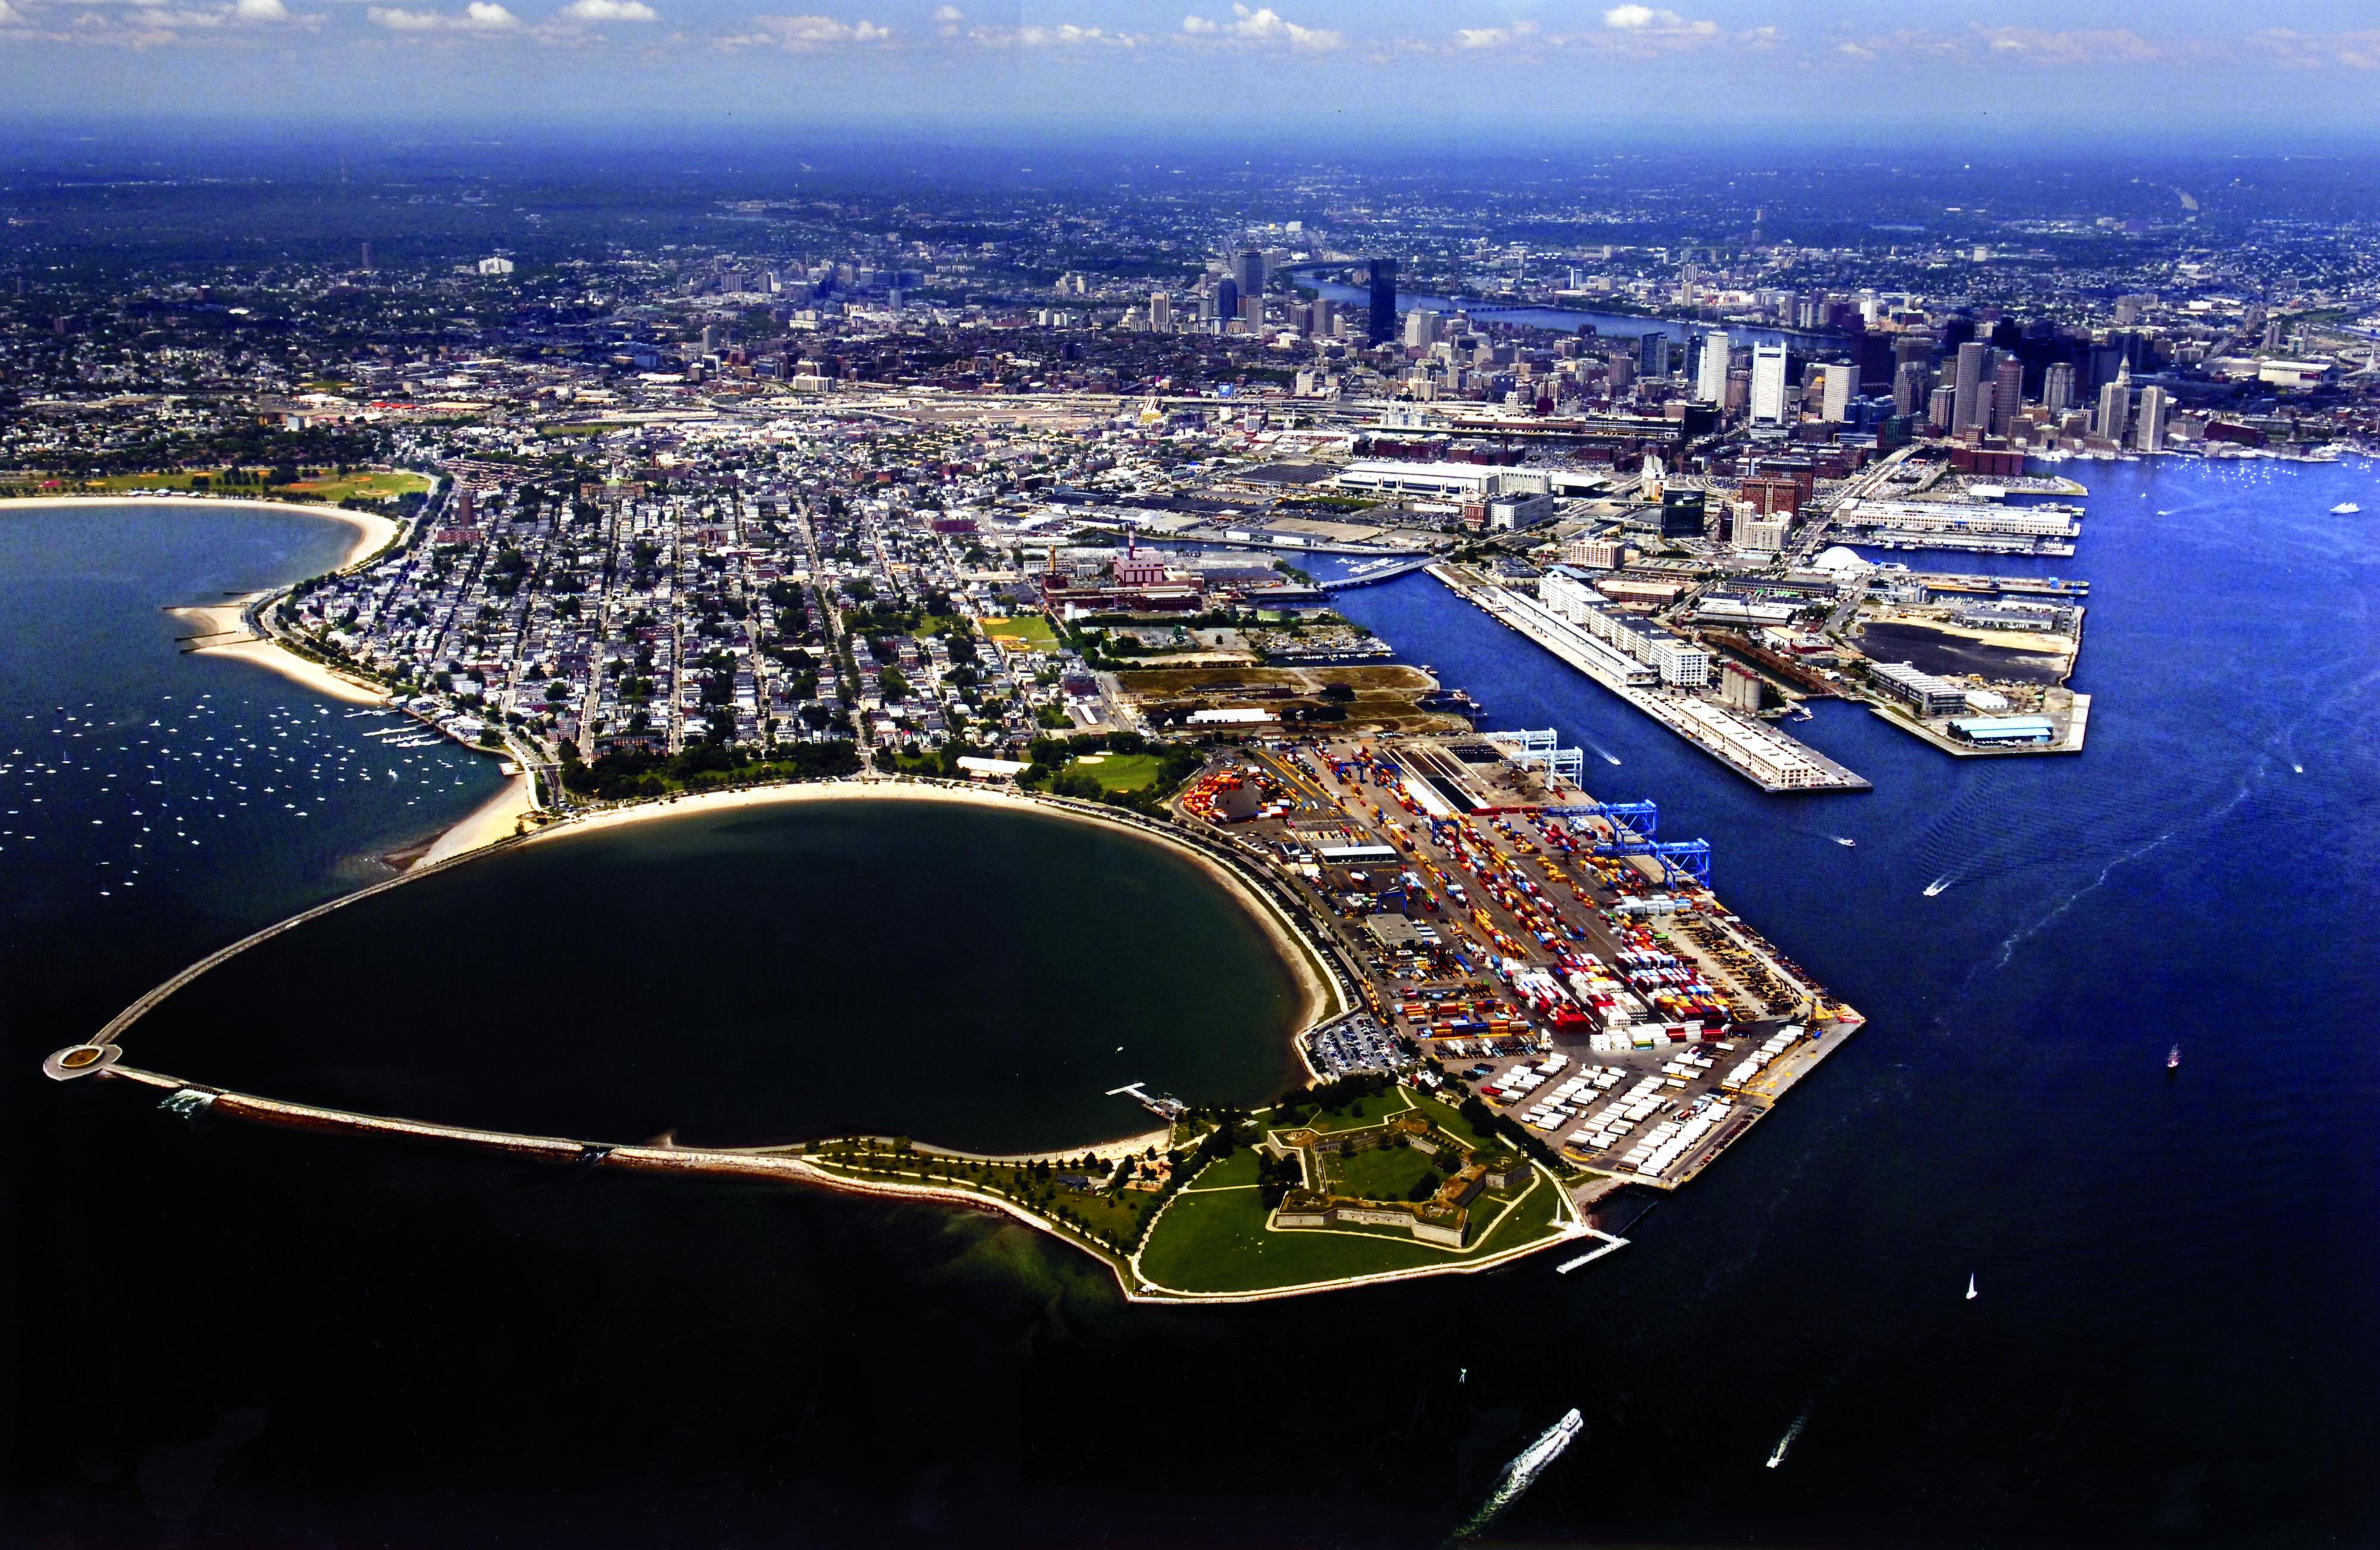 South Boston Luxury Real Estate, South Boston Rentals, South Boston Condos, Boston Real Estate